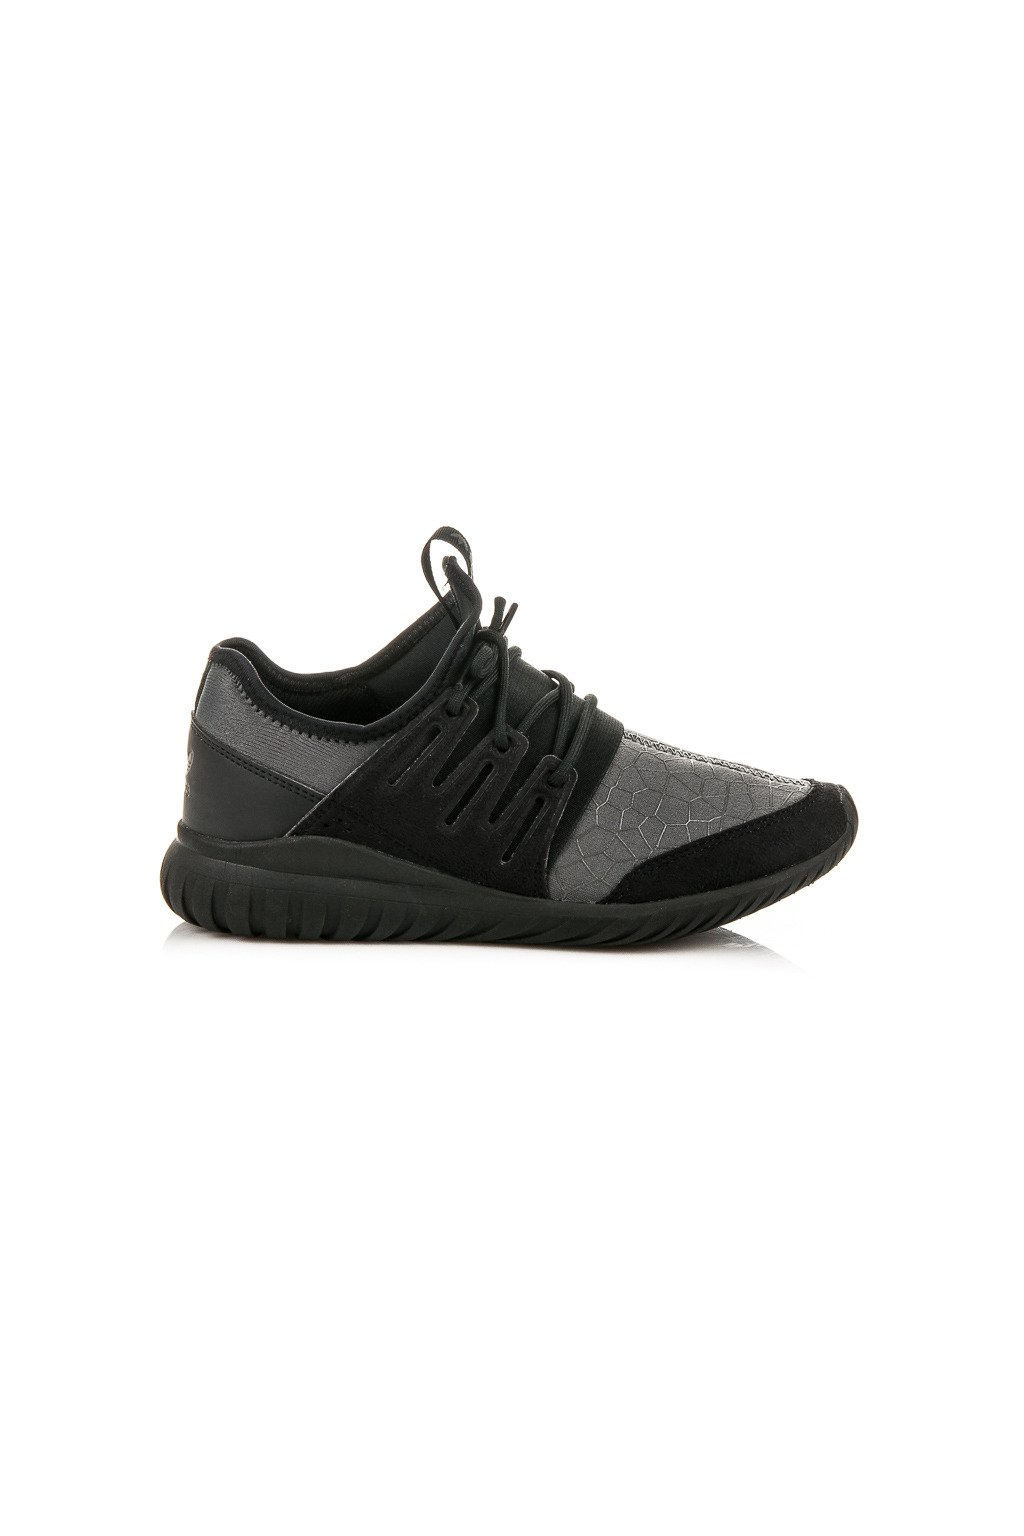 Čierne topánky Adidas kod S81919